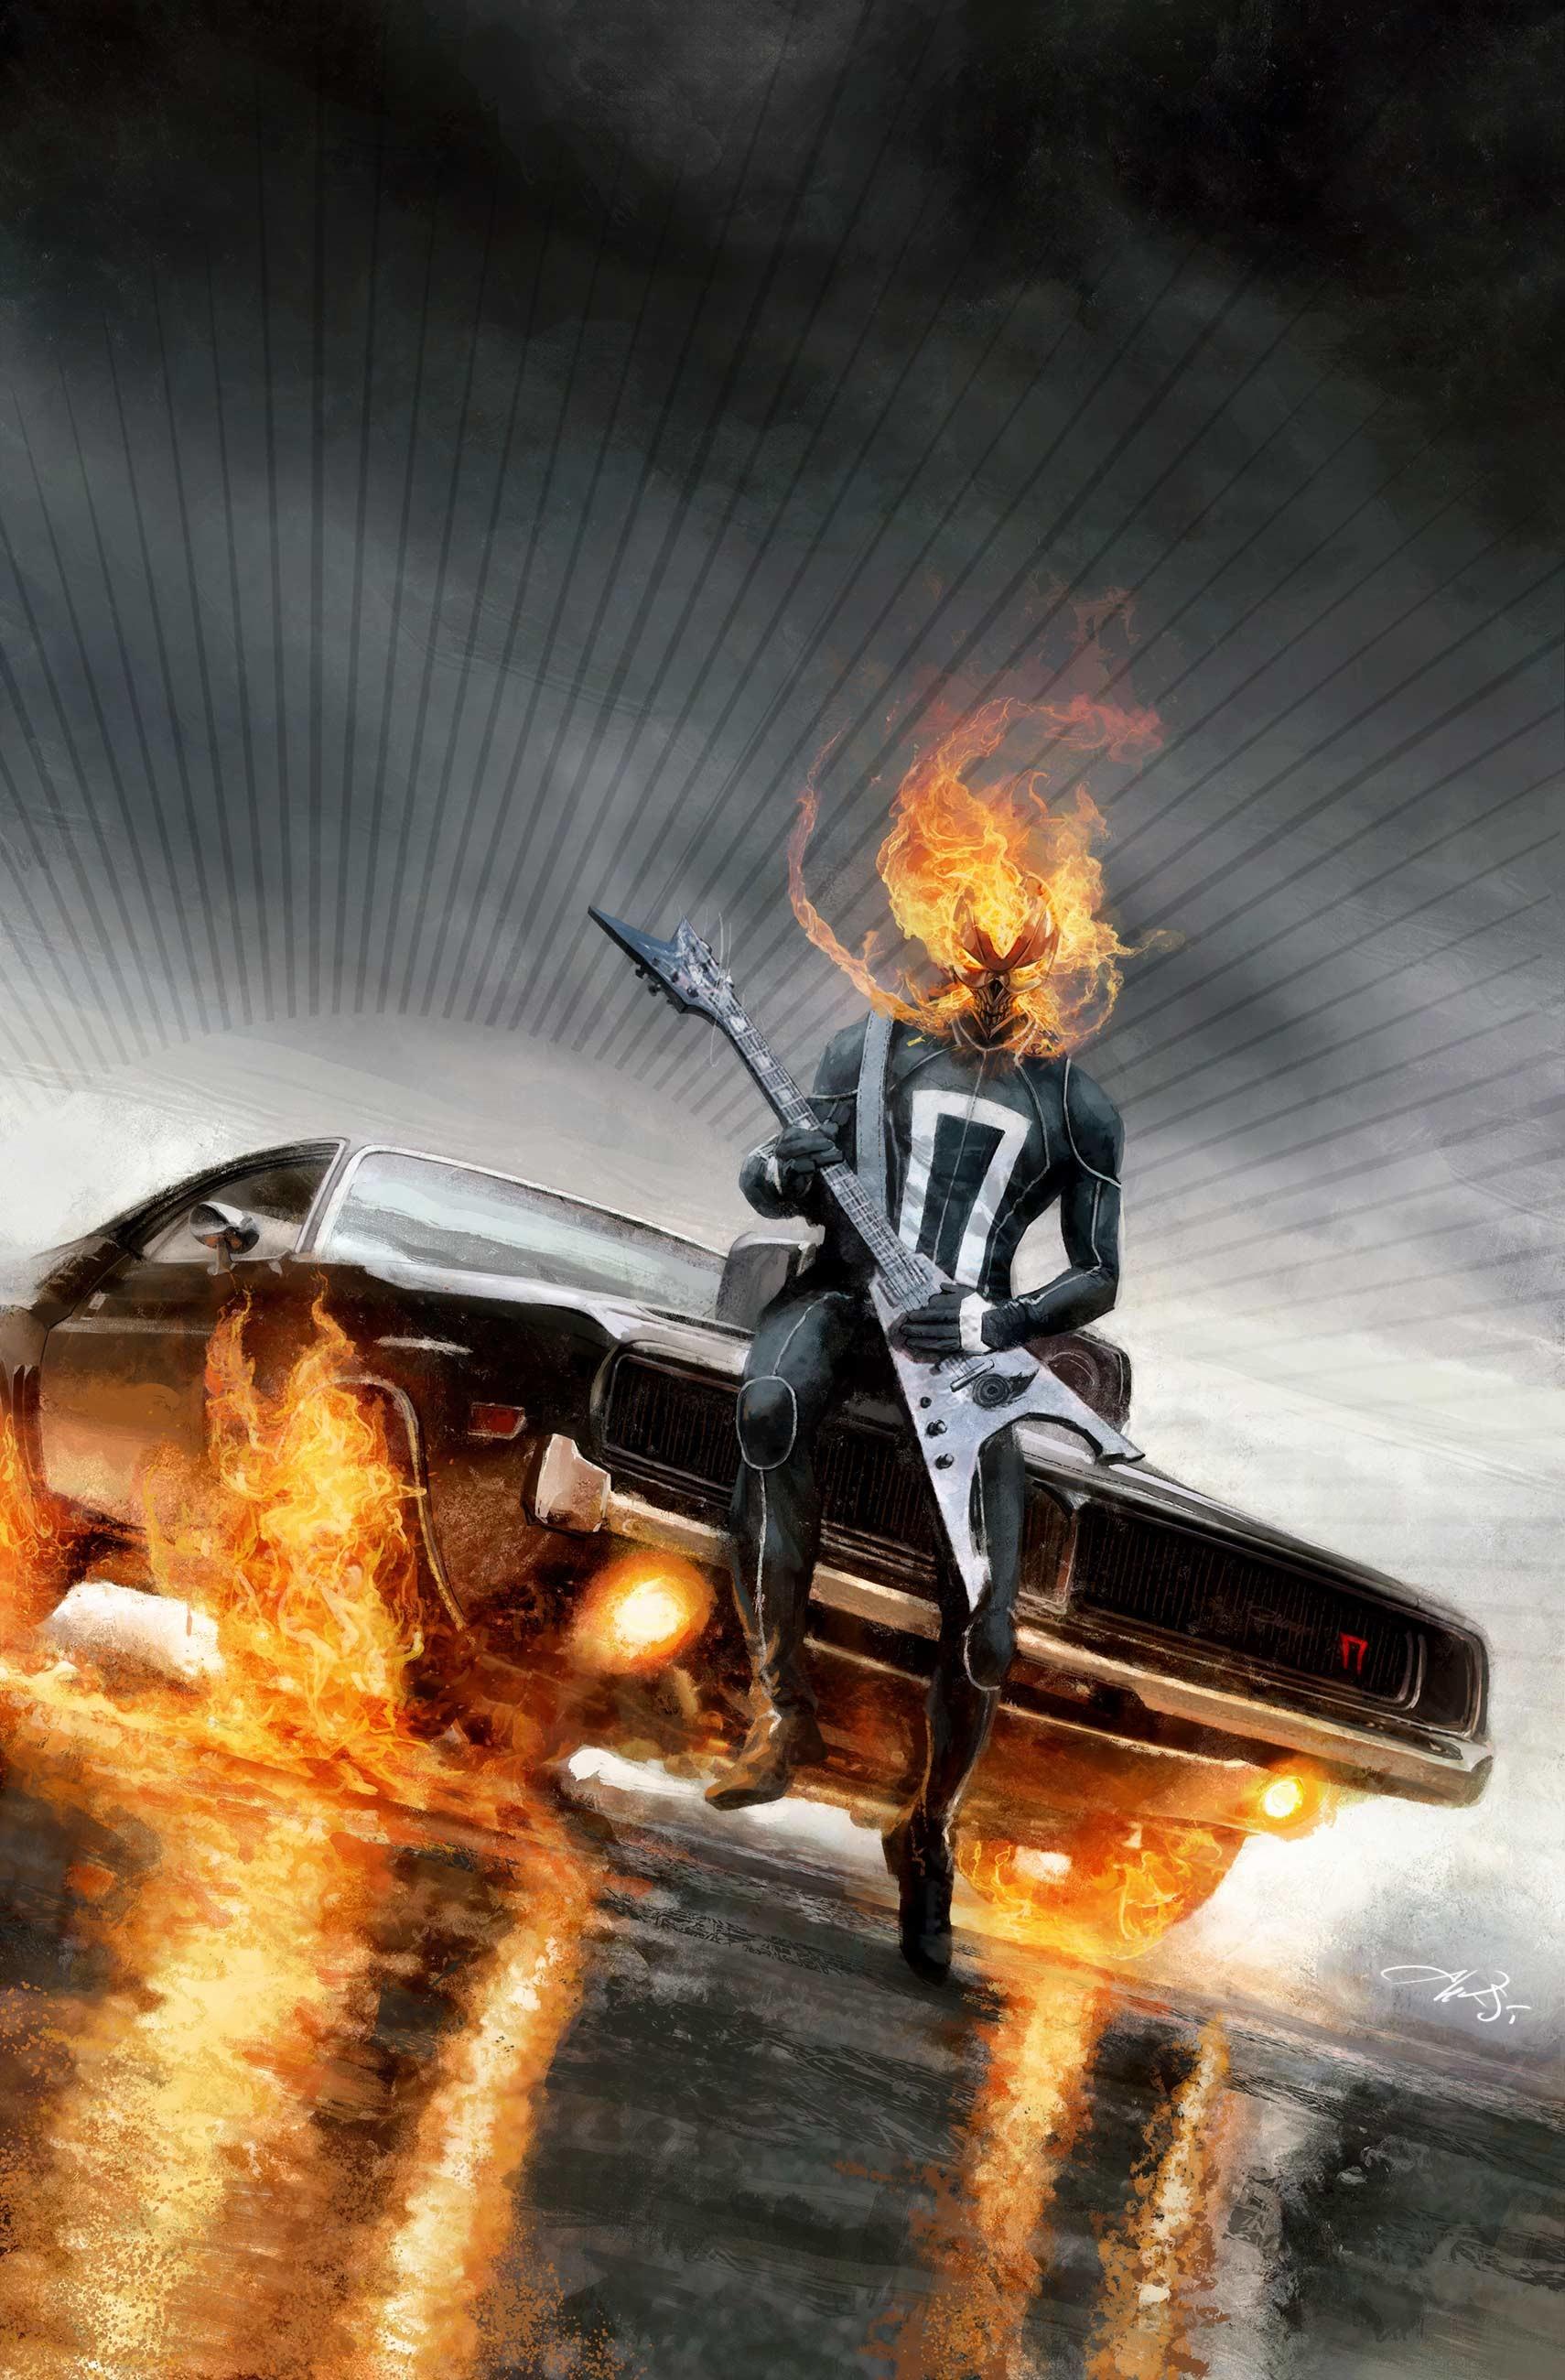 Aleksi briclot marvel ghostrider wi aleksi 01 raw